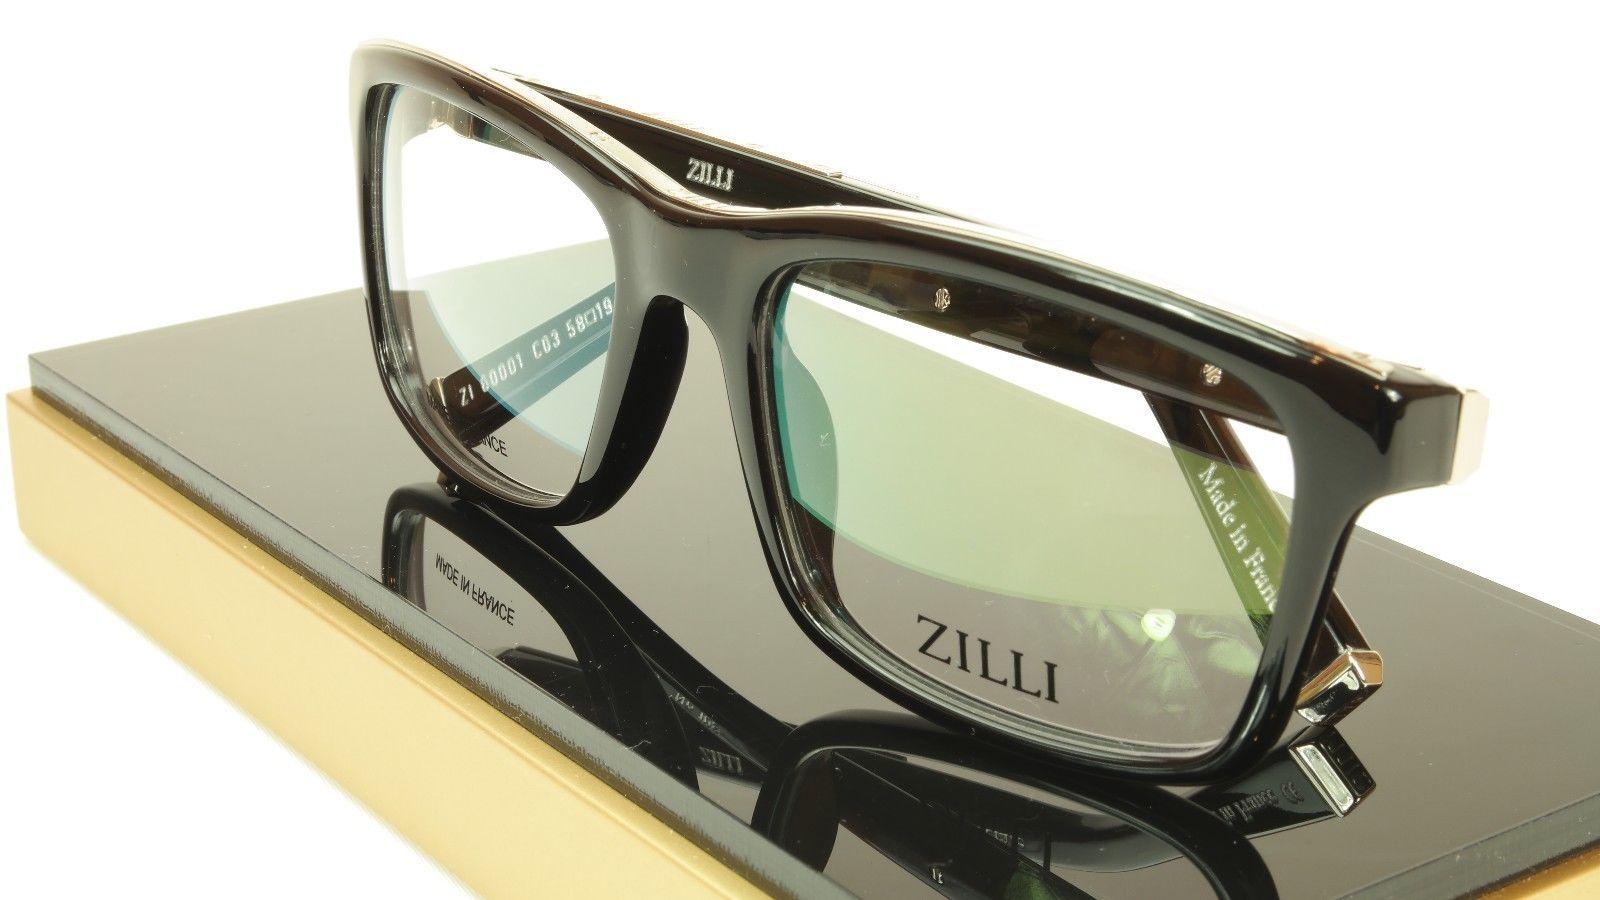 d2e09af5fac S l1600. S l1600. Previous. ZILLI Eyeglasses Frame Acetate Leather Titanium  France Hand Made ZI 60001 C03